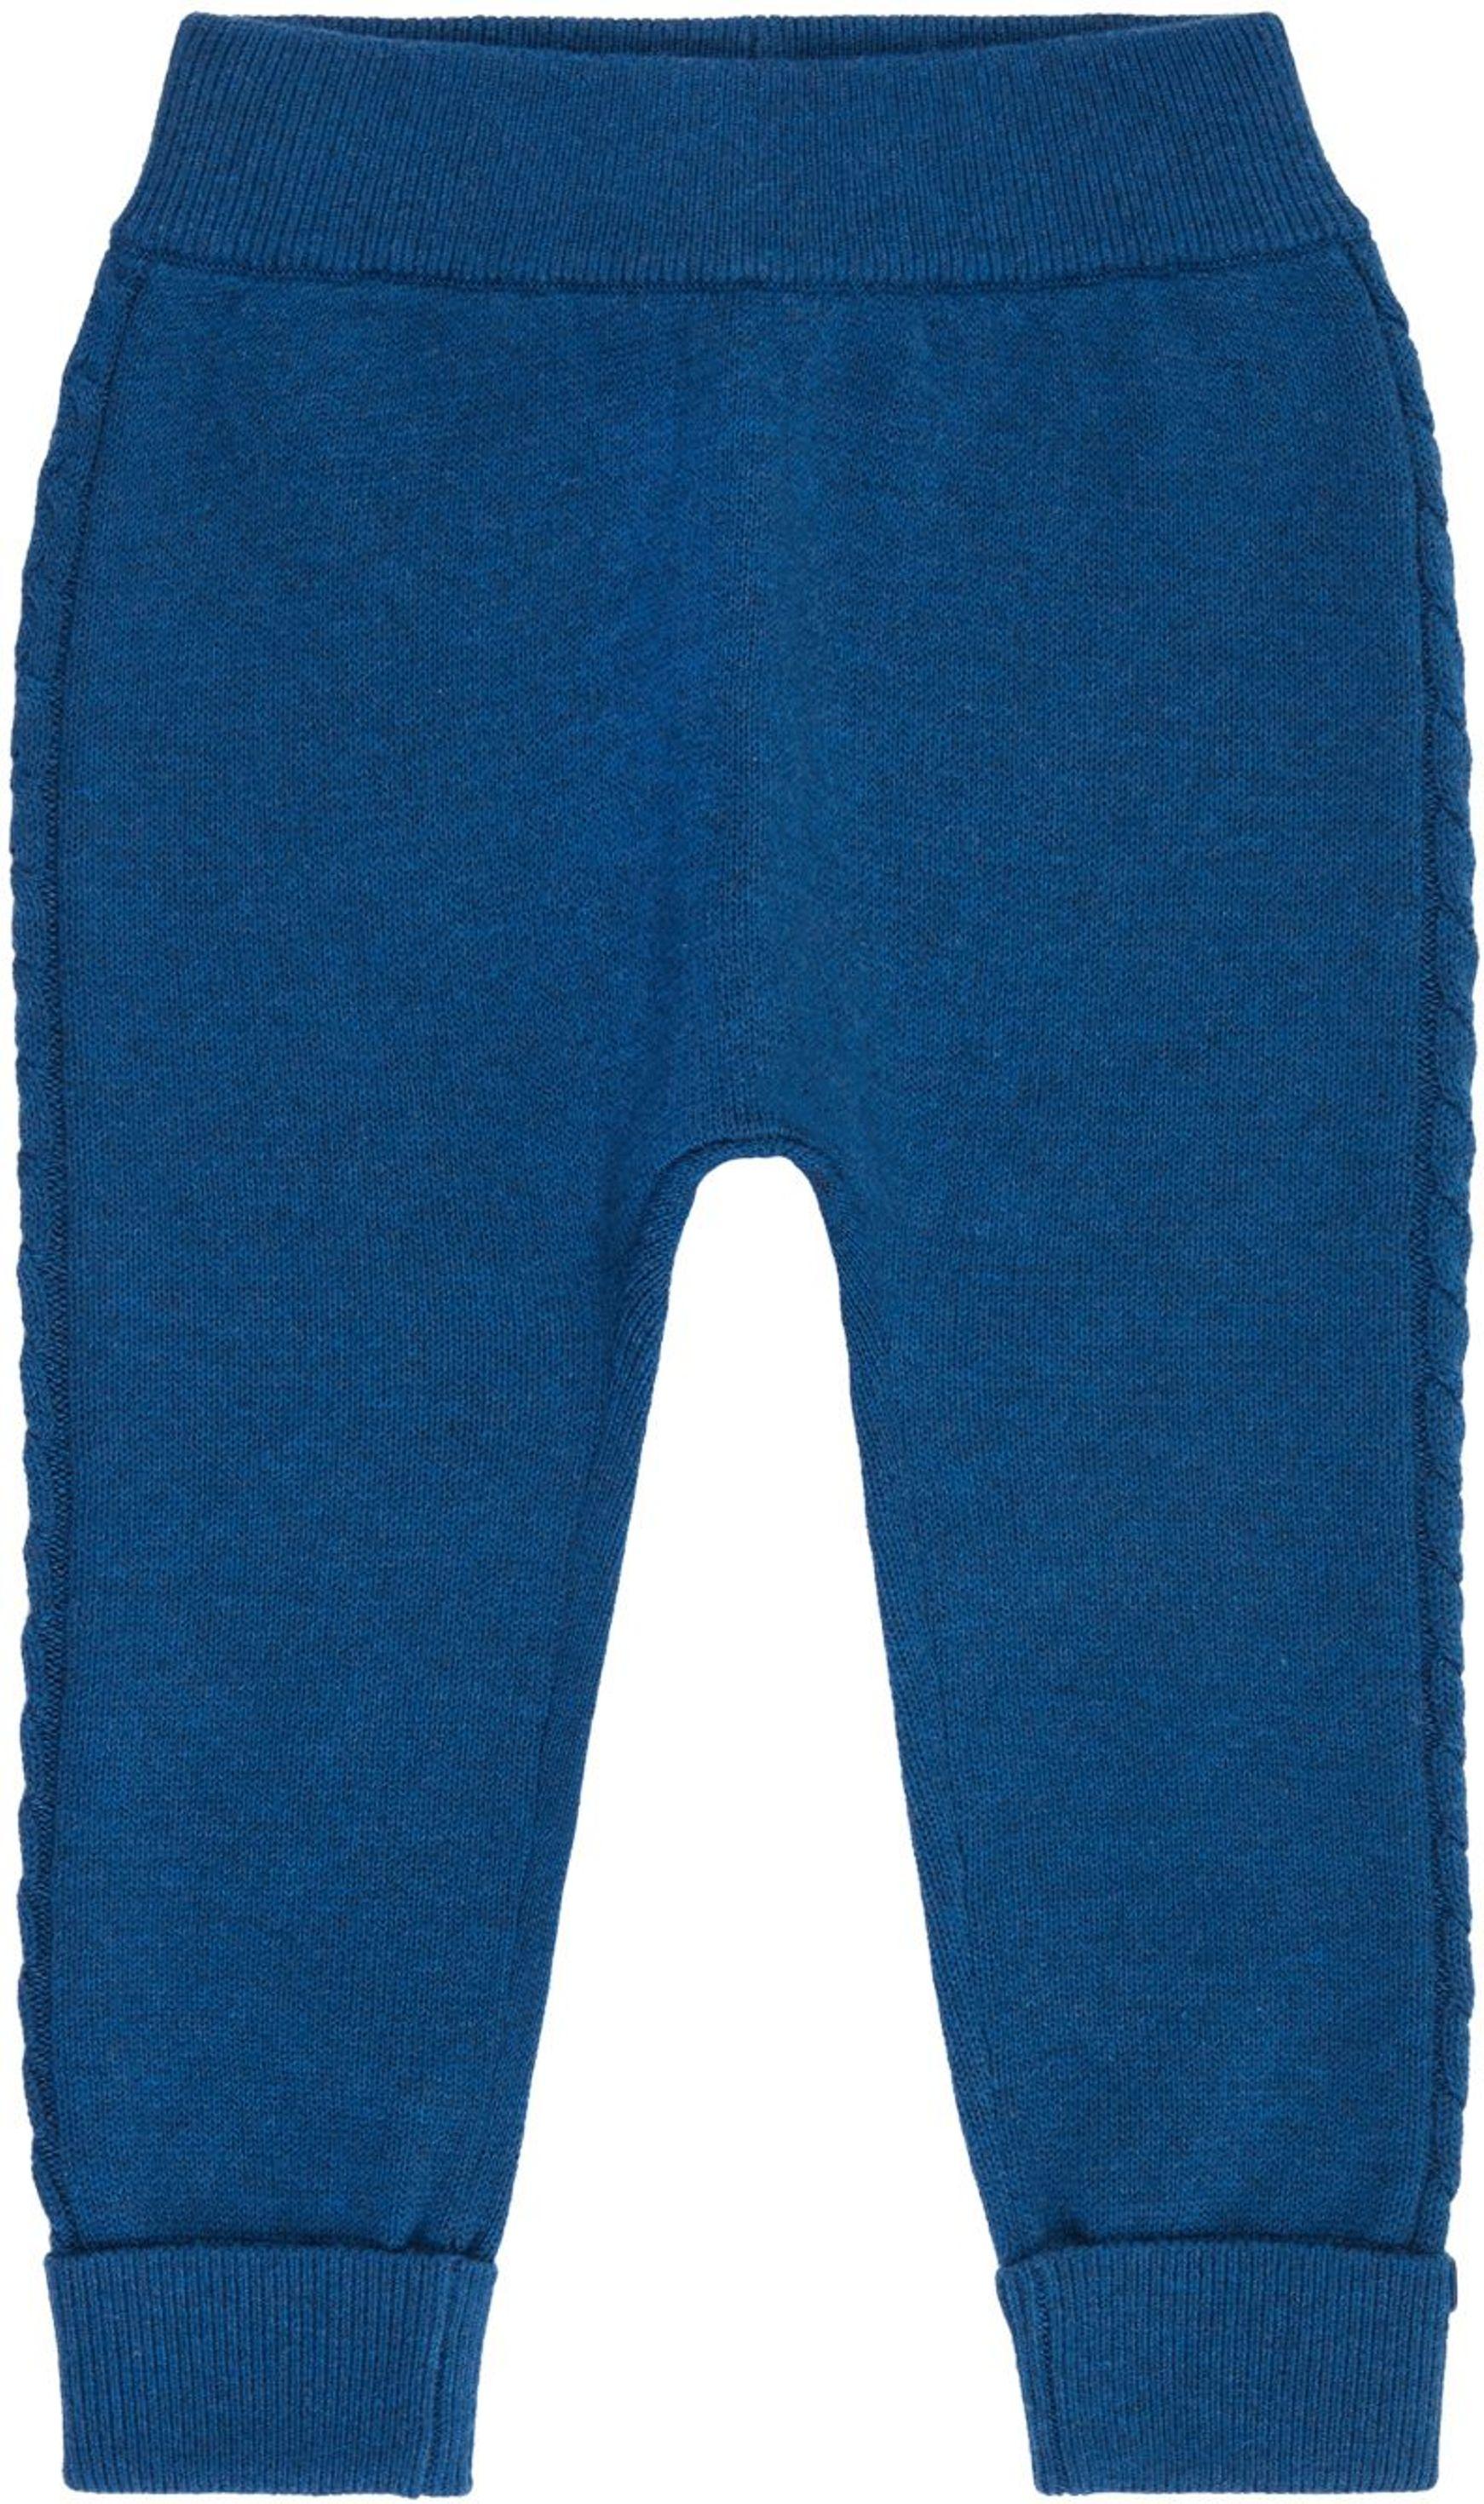 Sense Organic PABLO Baby Knitted Leggings blue